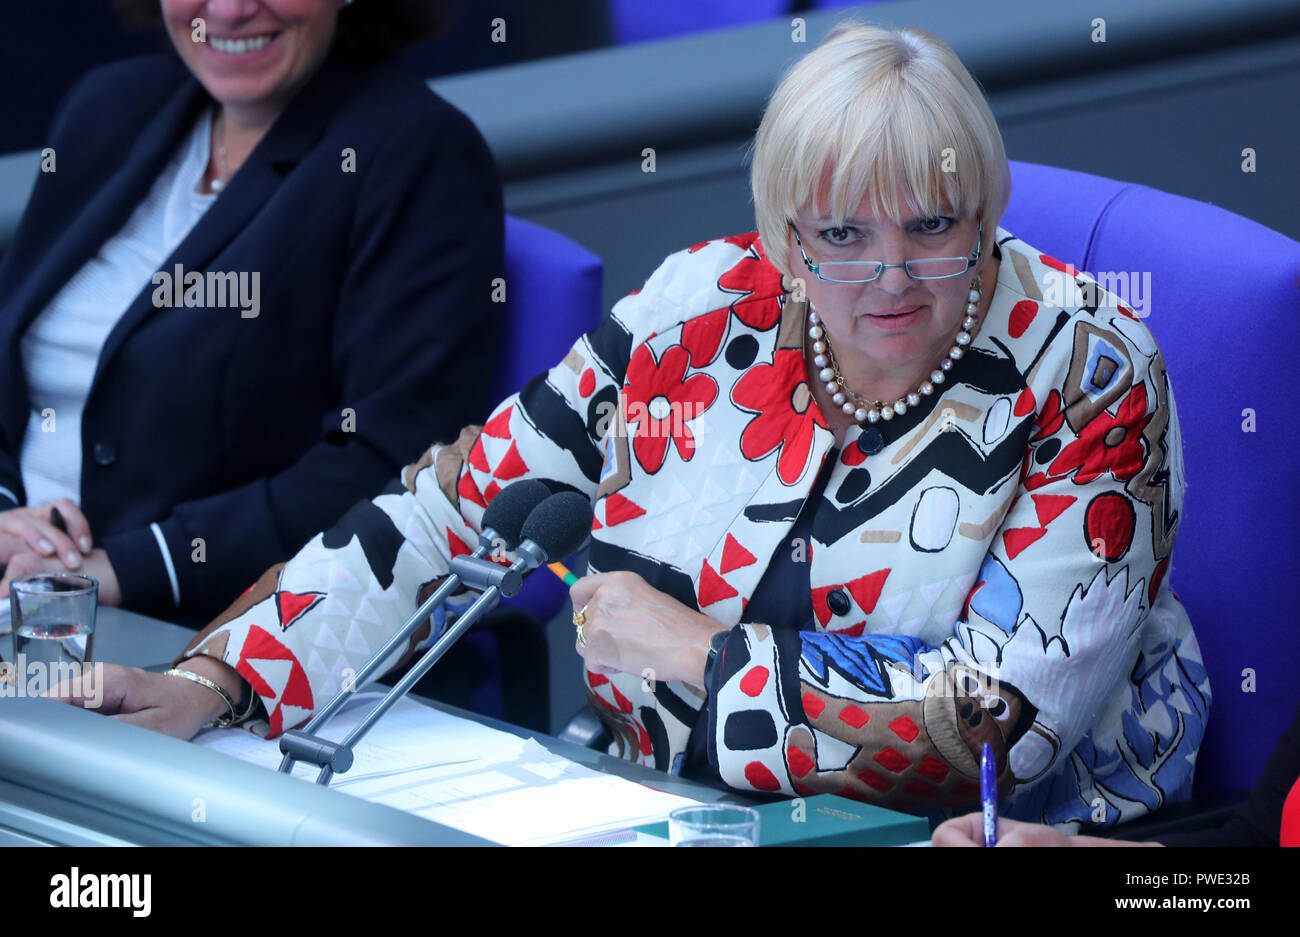 11 October 2018, Berlin: 11 October 2018, Germany, Berlin:Claudia Roth (Alliance 90/Greens), Deputy President of the Bundestag, speaks in the Bundestag. Photo: Jens Büttner/dpa-Zentralbild/dpa - Stock Image